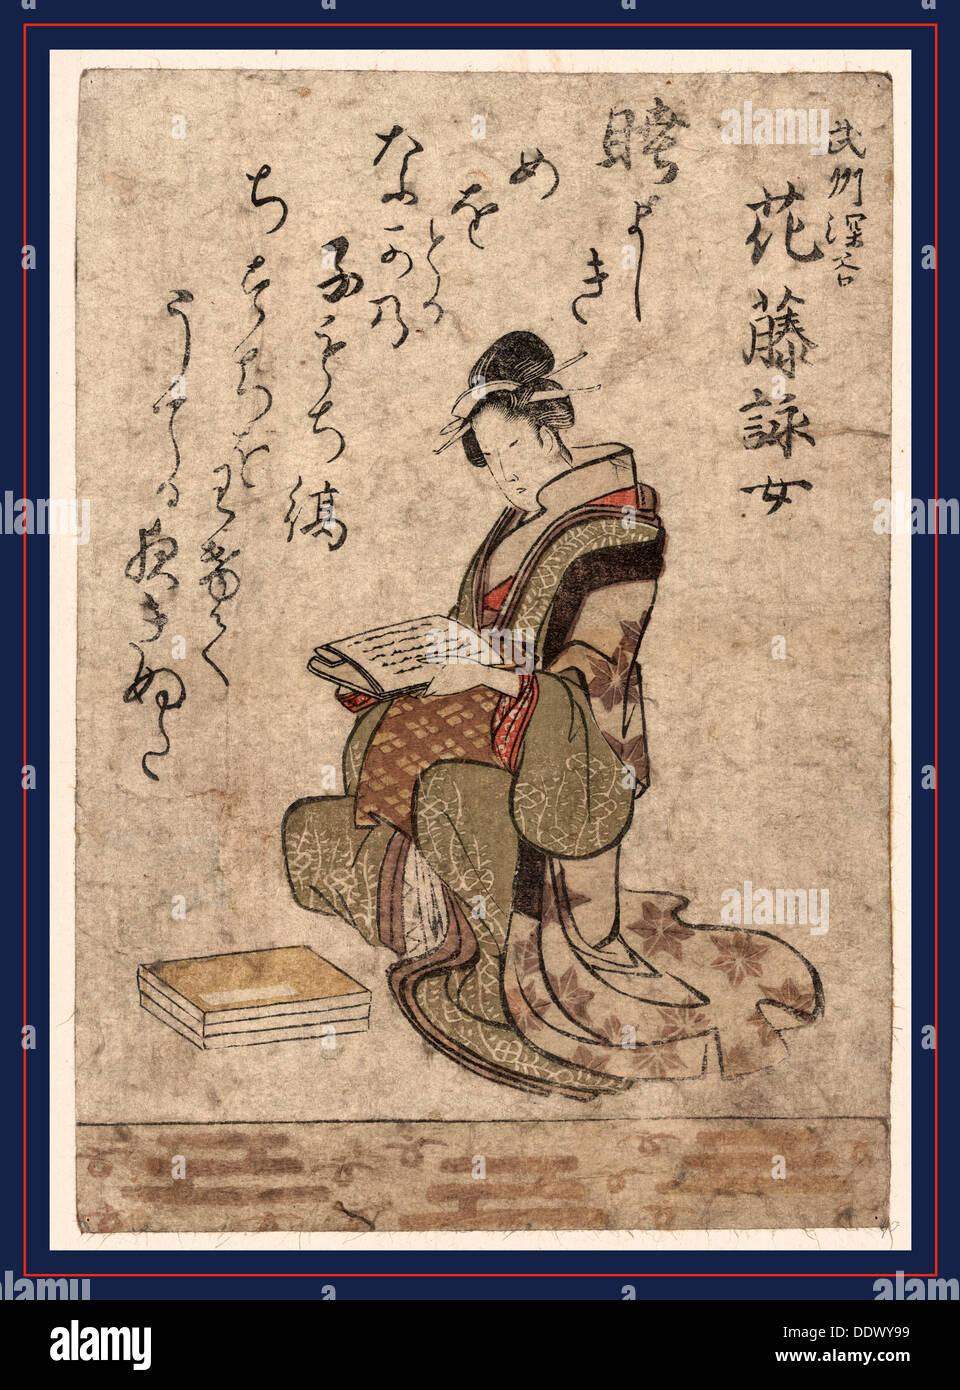 Hanafuji eijo, The beauty Anafuji Eijo. [between 1801 and 1805], 1 print : woodcut, color ; 20.2 x 14 cm., Print shows Hanafuji - Stock Image